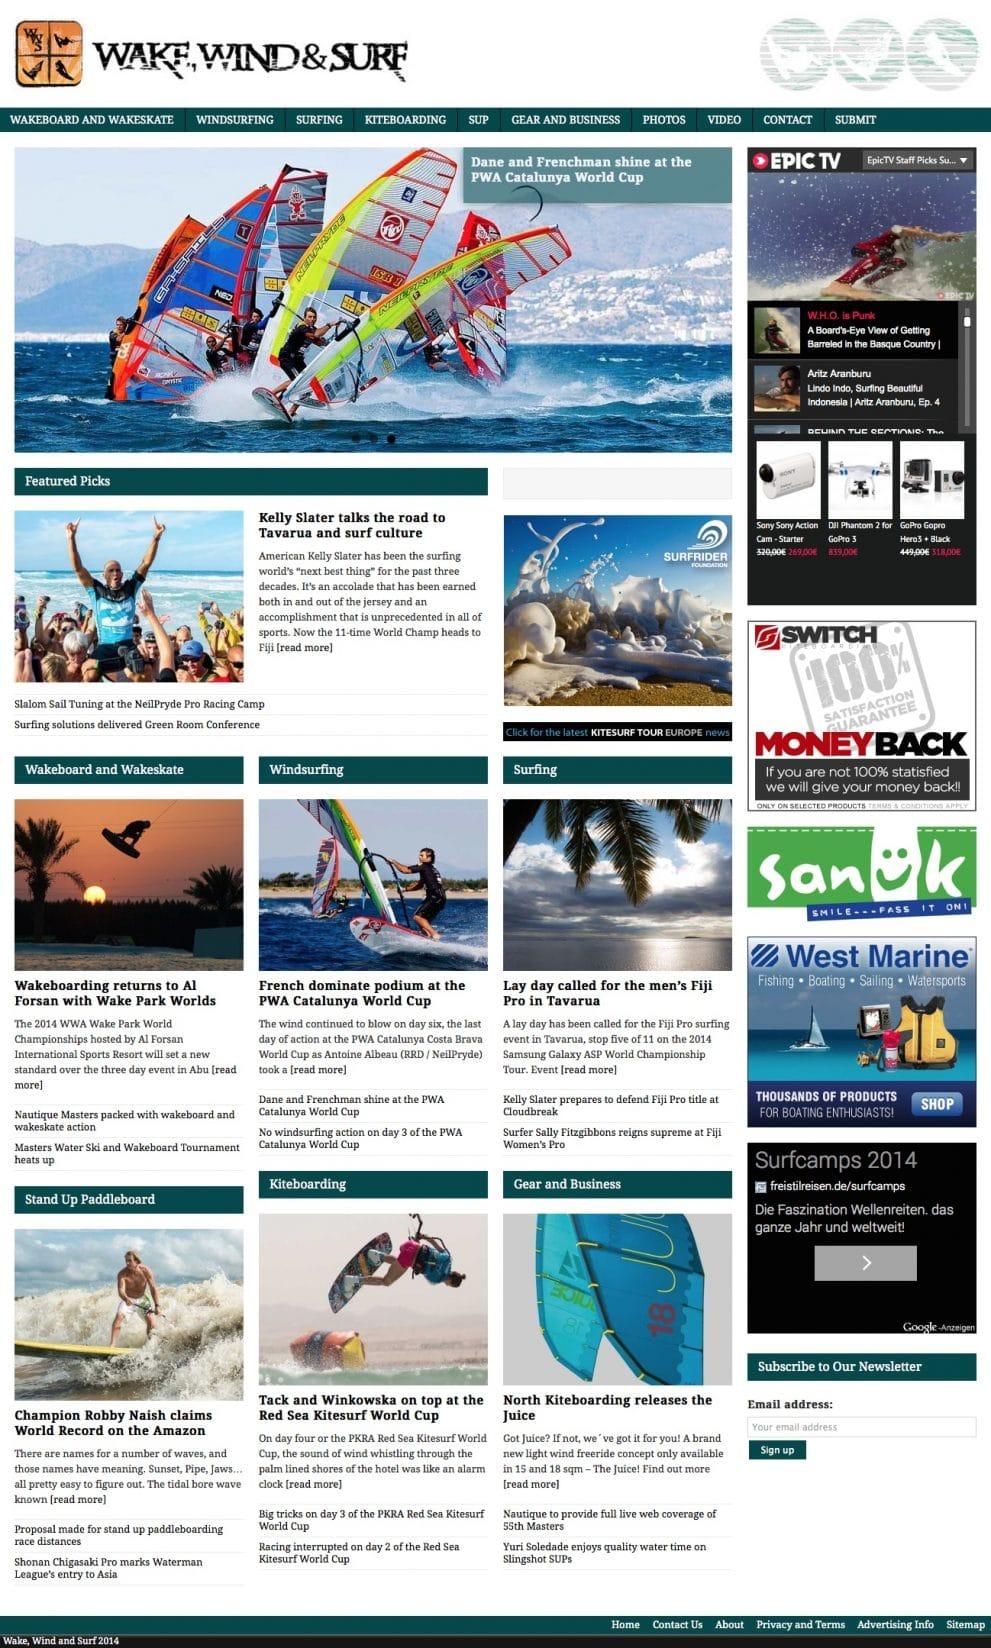 Wake, Wind & Surf News